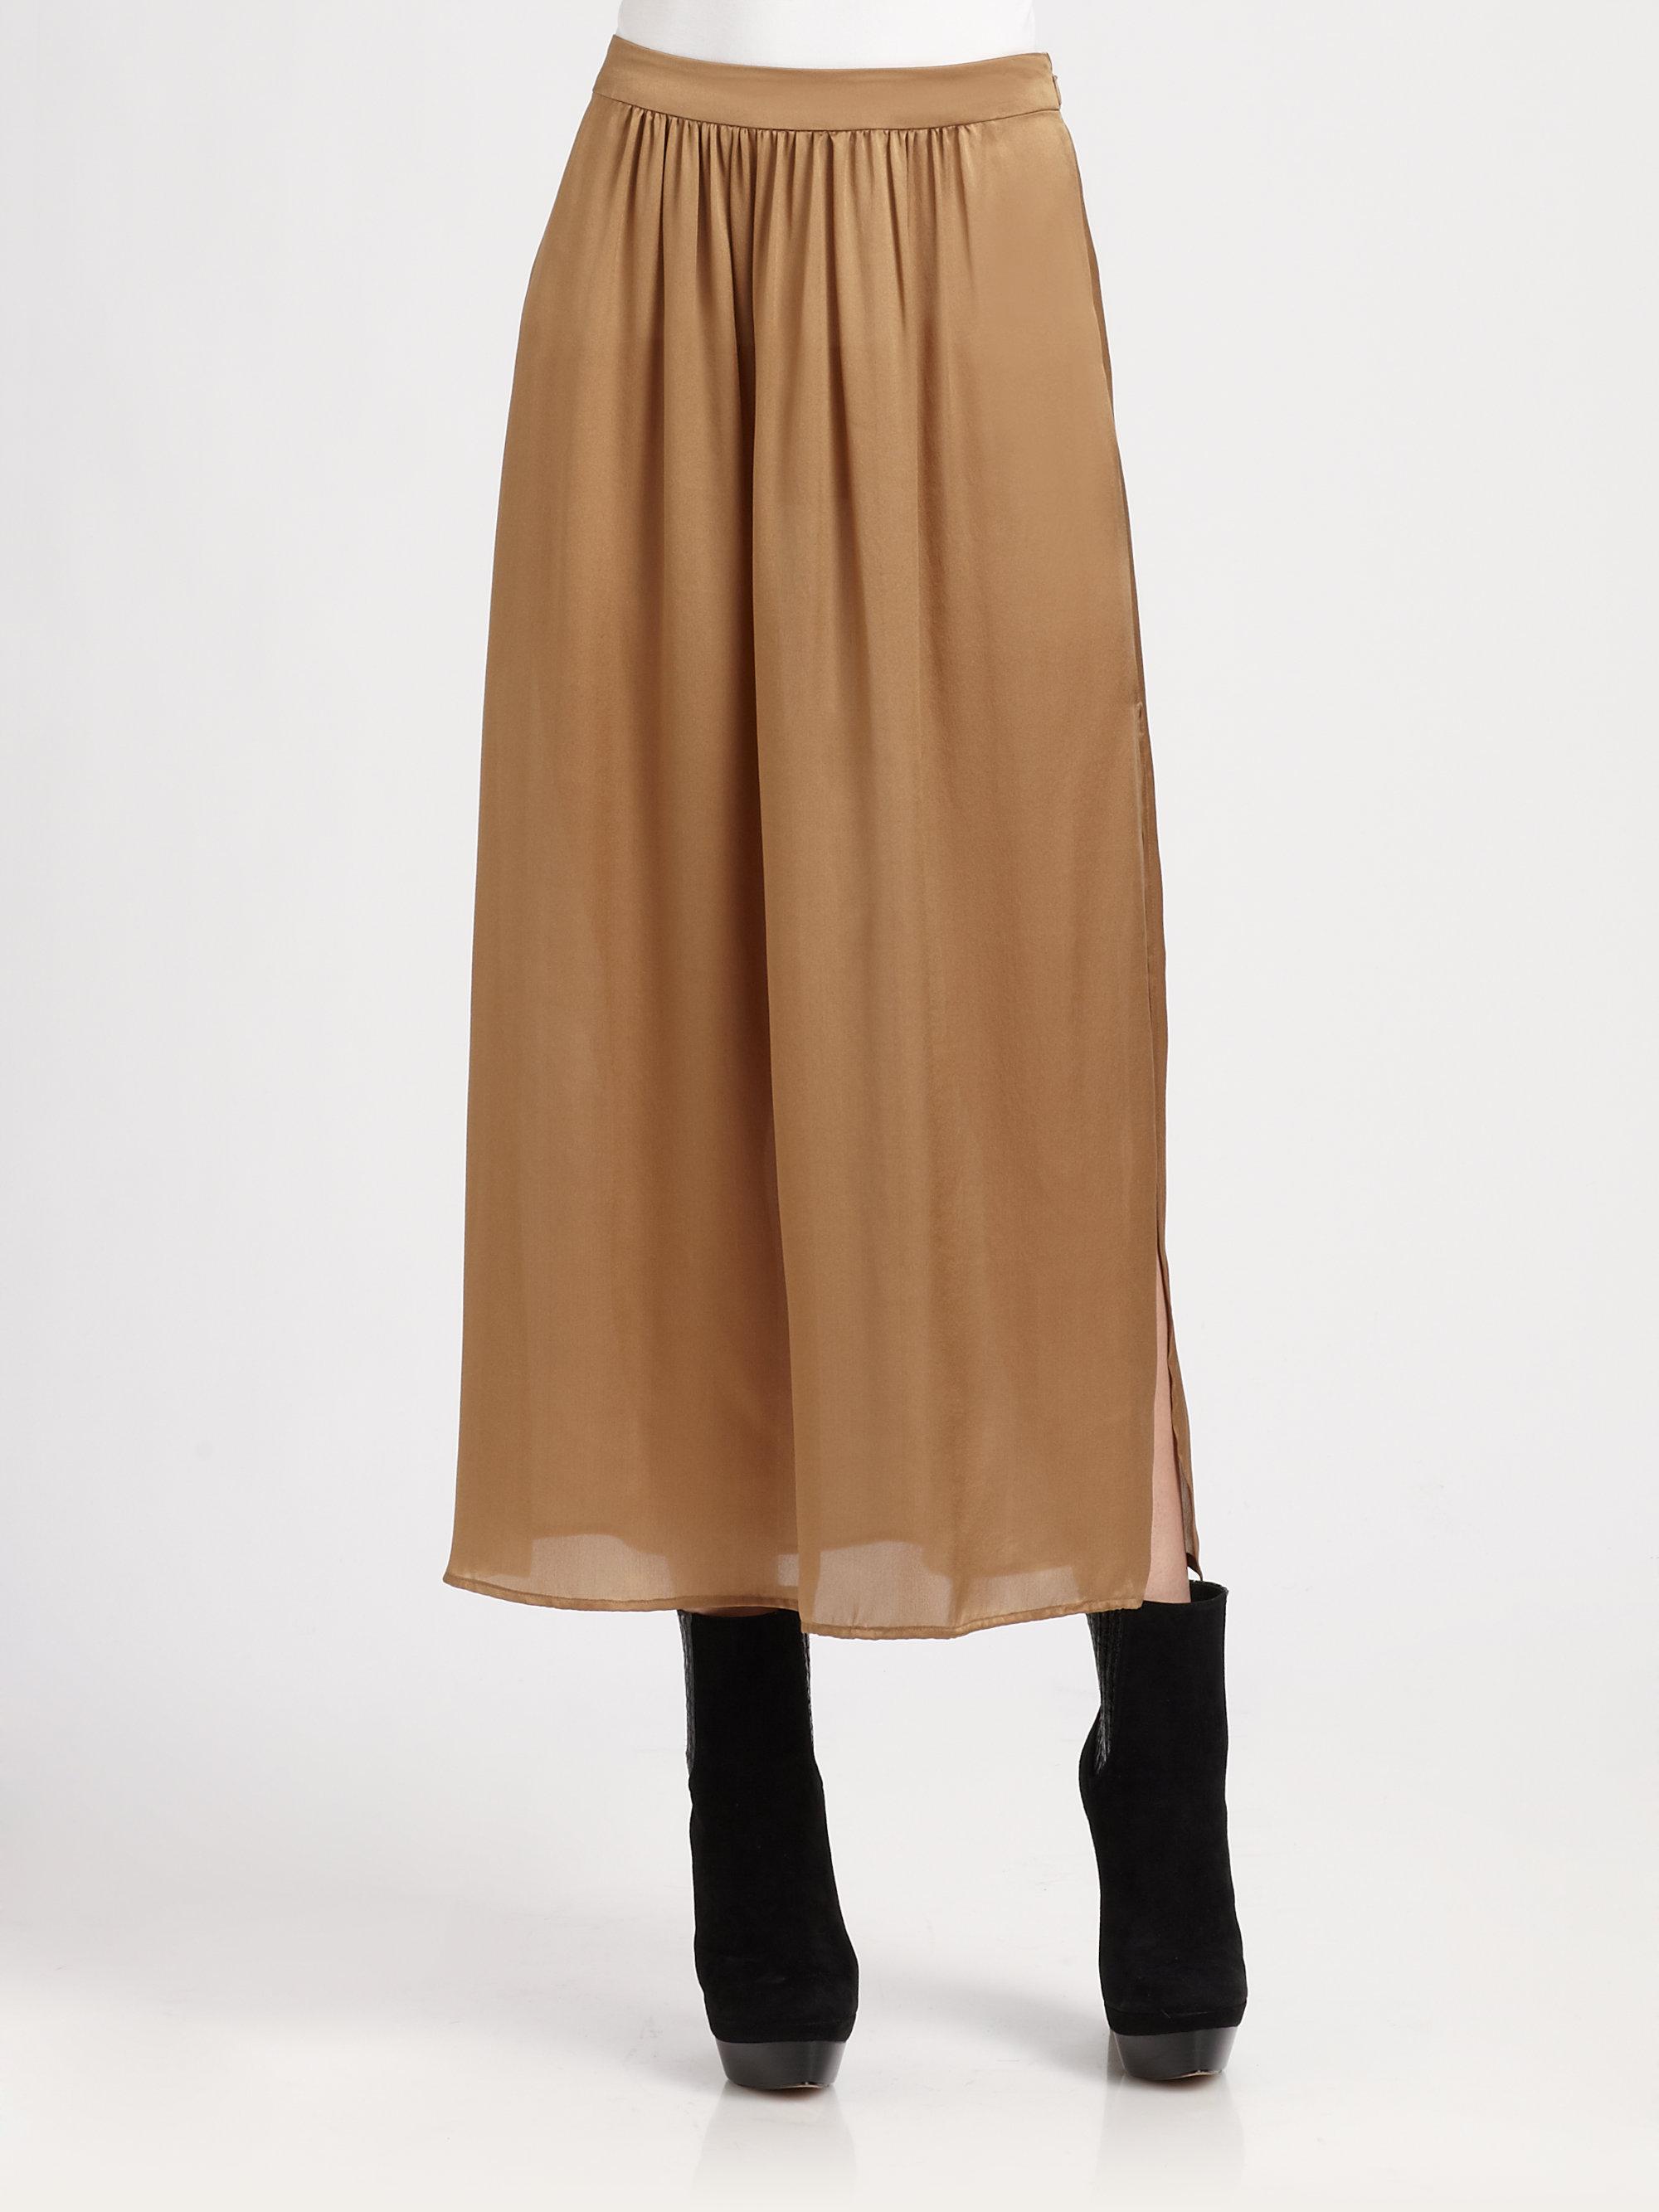 Rachel zoe Delphine Silk Midi Skirt in Brown | Lyst